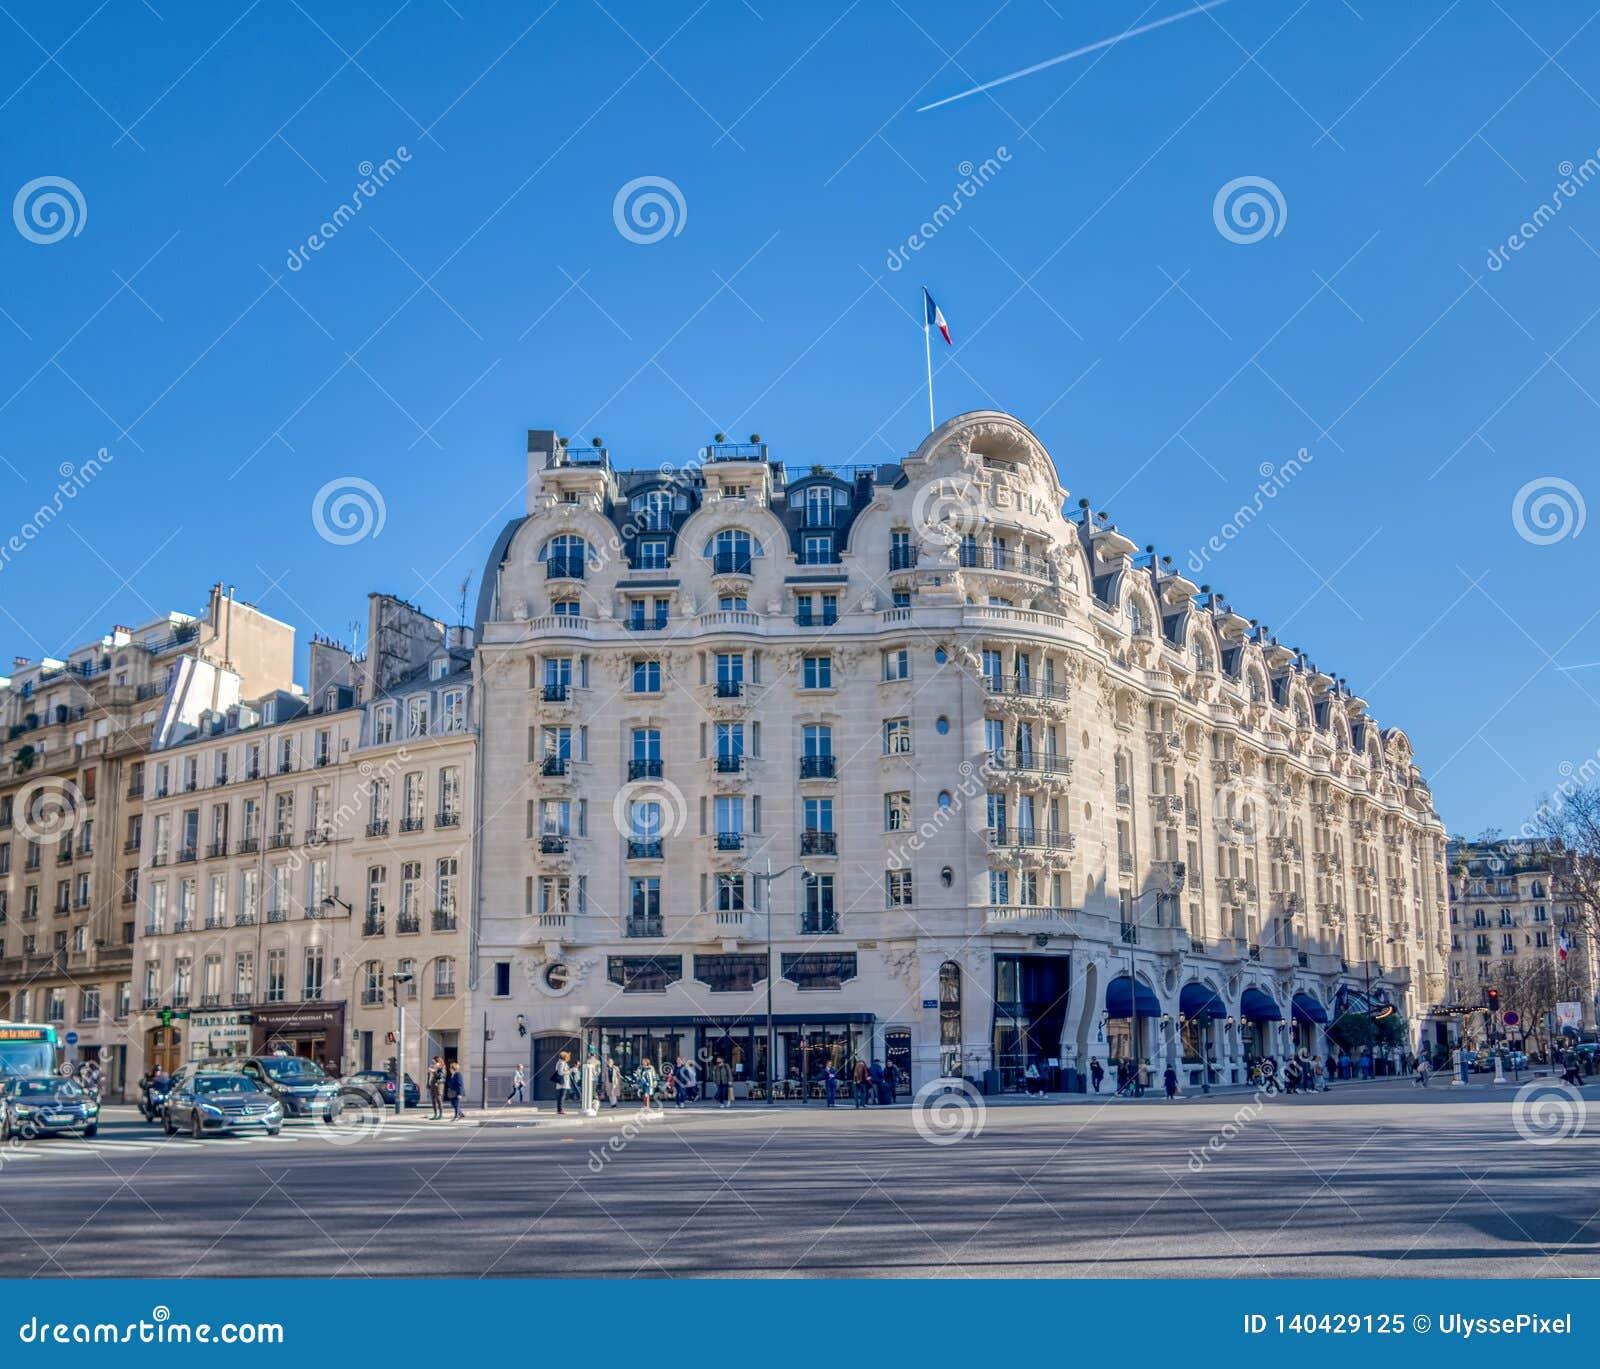 Hotel Lutetia Paris France Editorial Image Image Of Deco